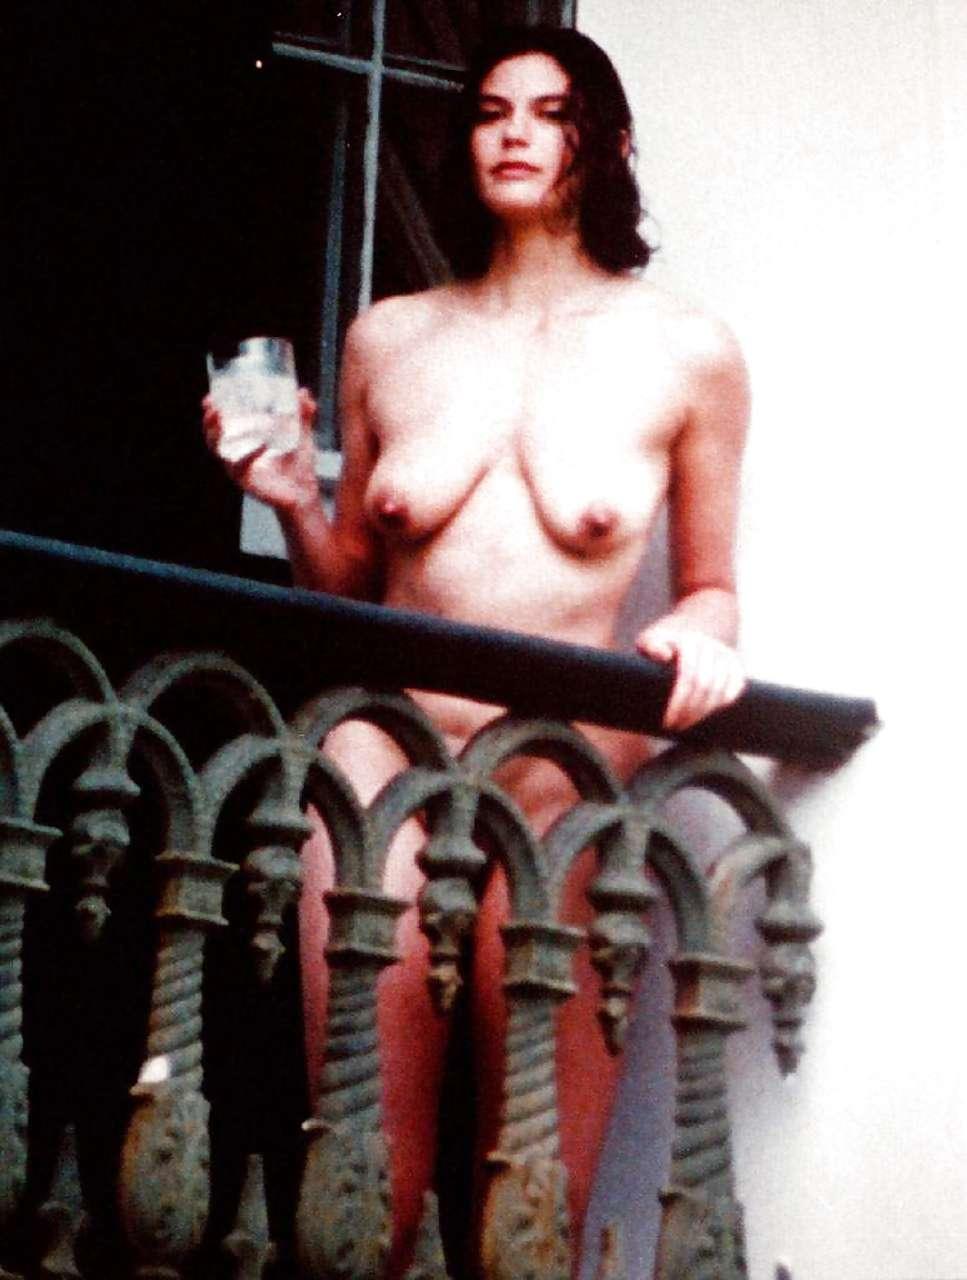 Todofakes Teri Hatcher Desnuda 06